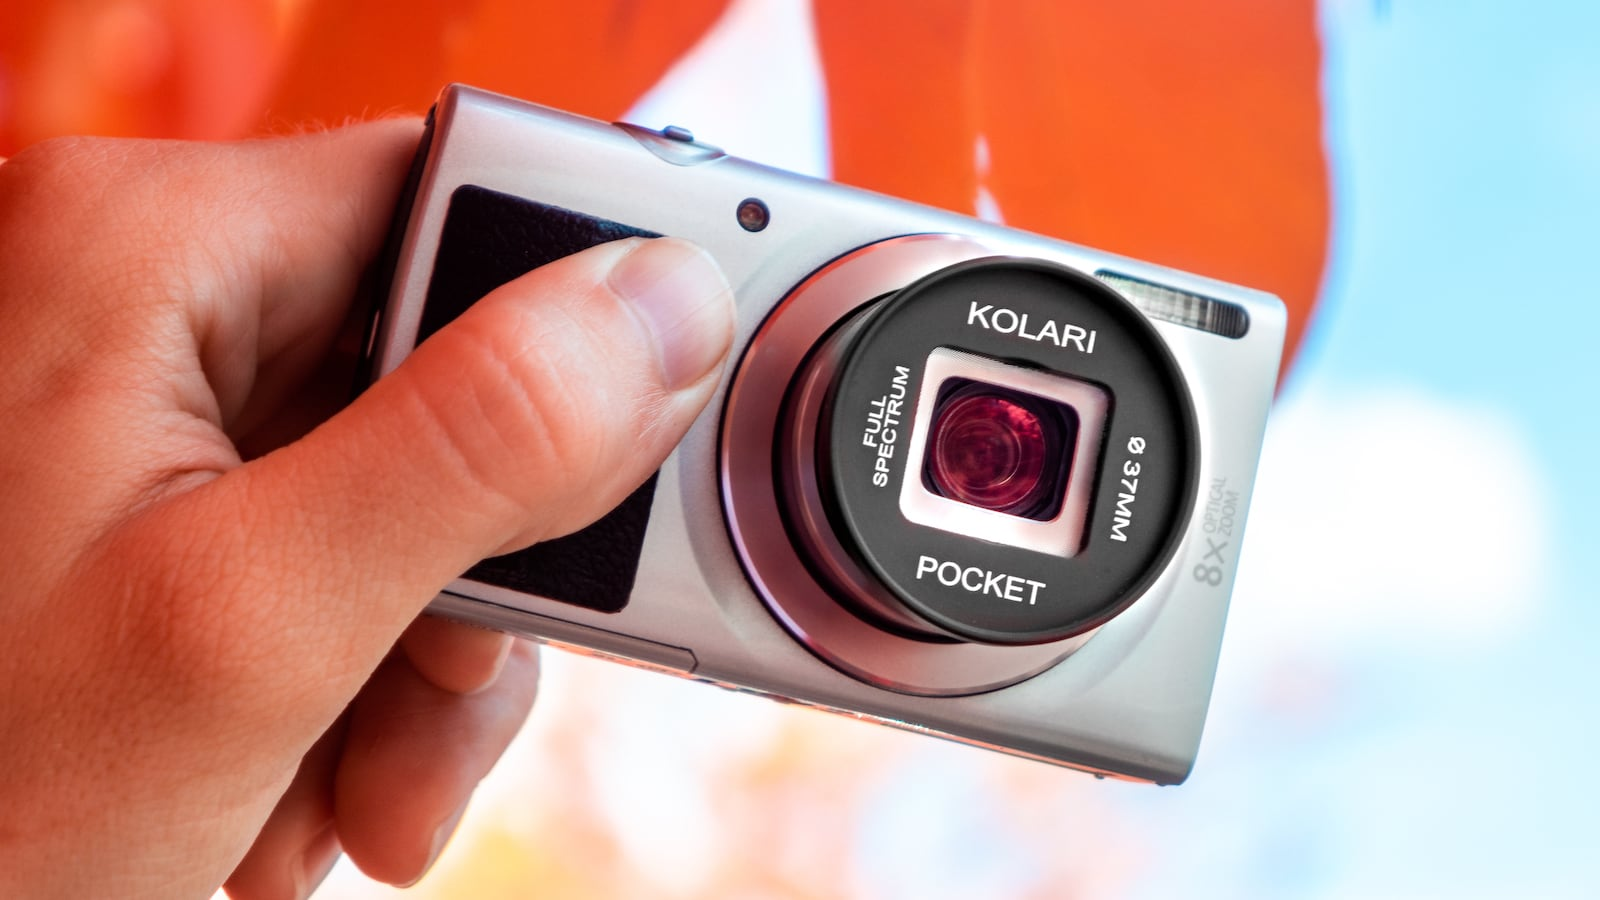 Kolari Pocket All-in-One Full Spectrum Camera